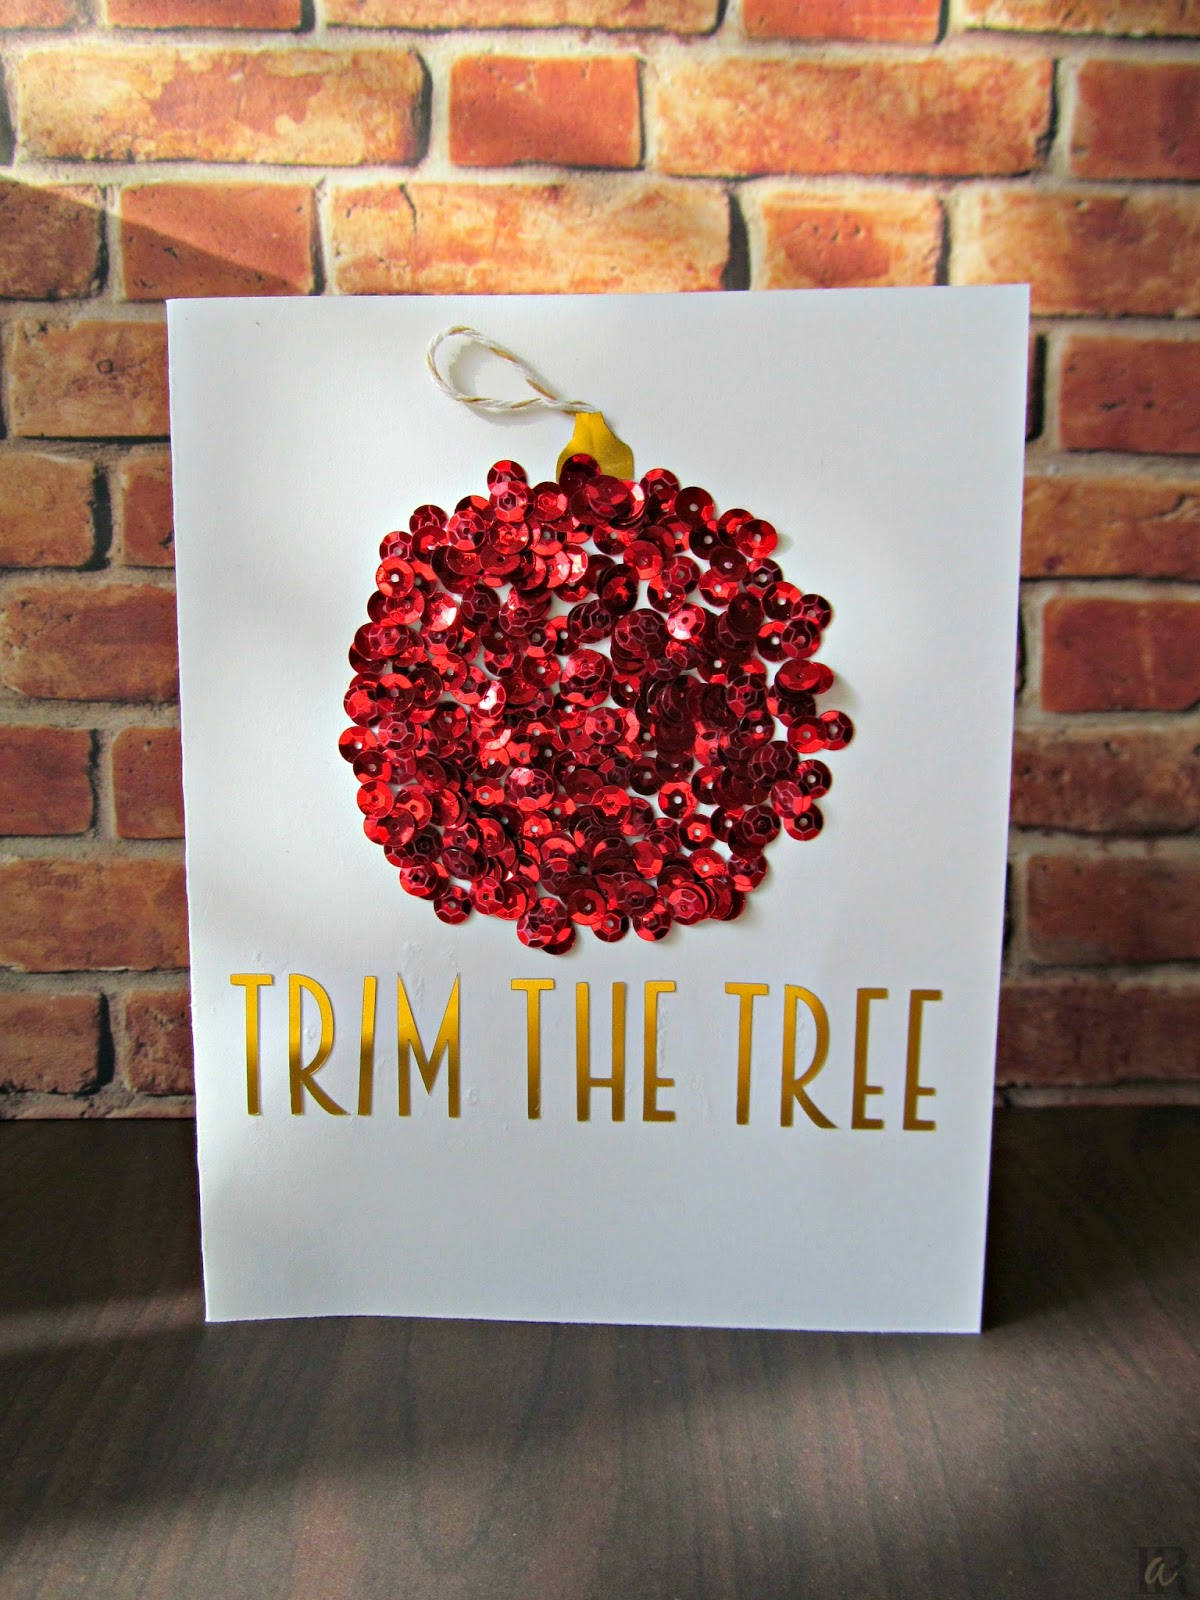 Tim the Tree